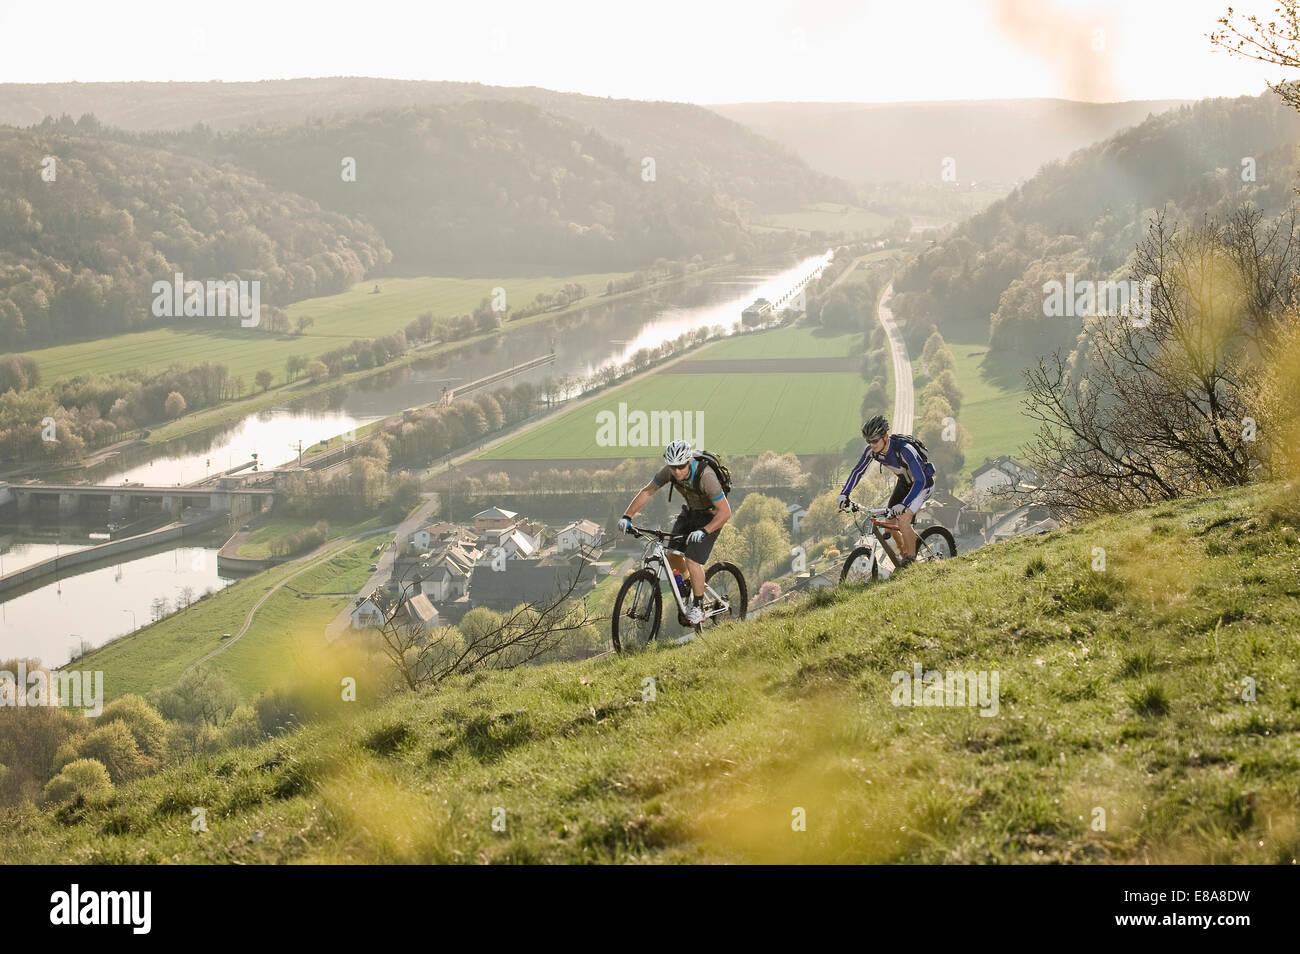 Young men mountainbiking at sunset, Bavaria, Germany - Stock Image